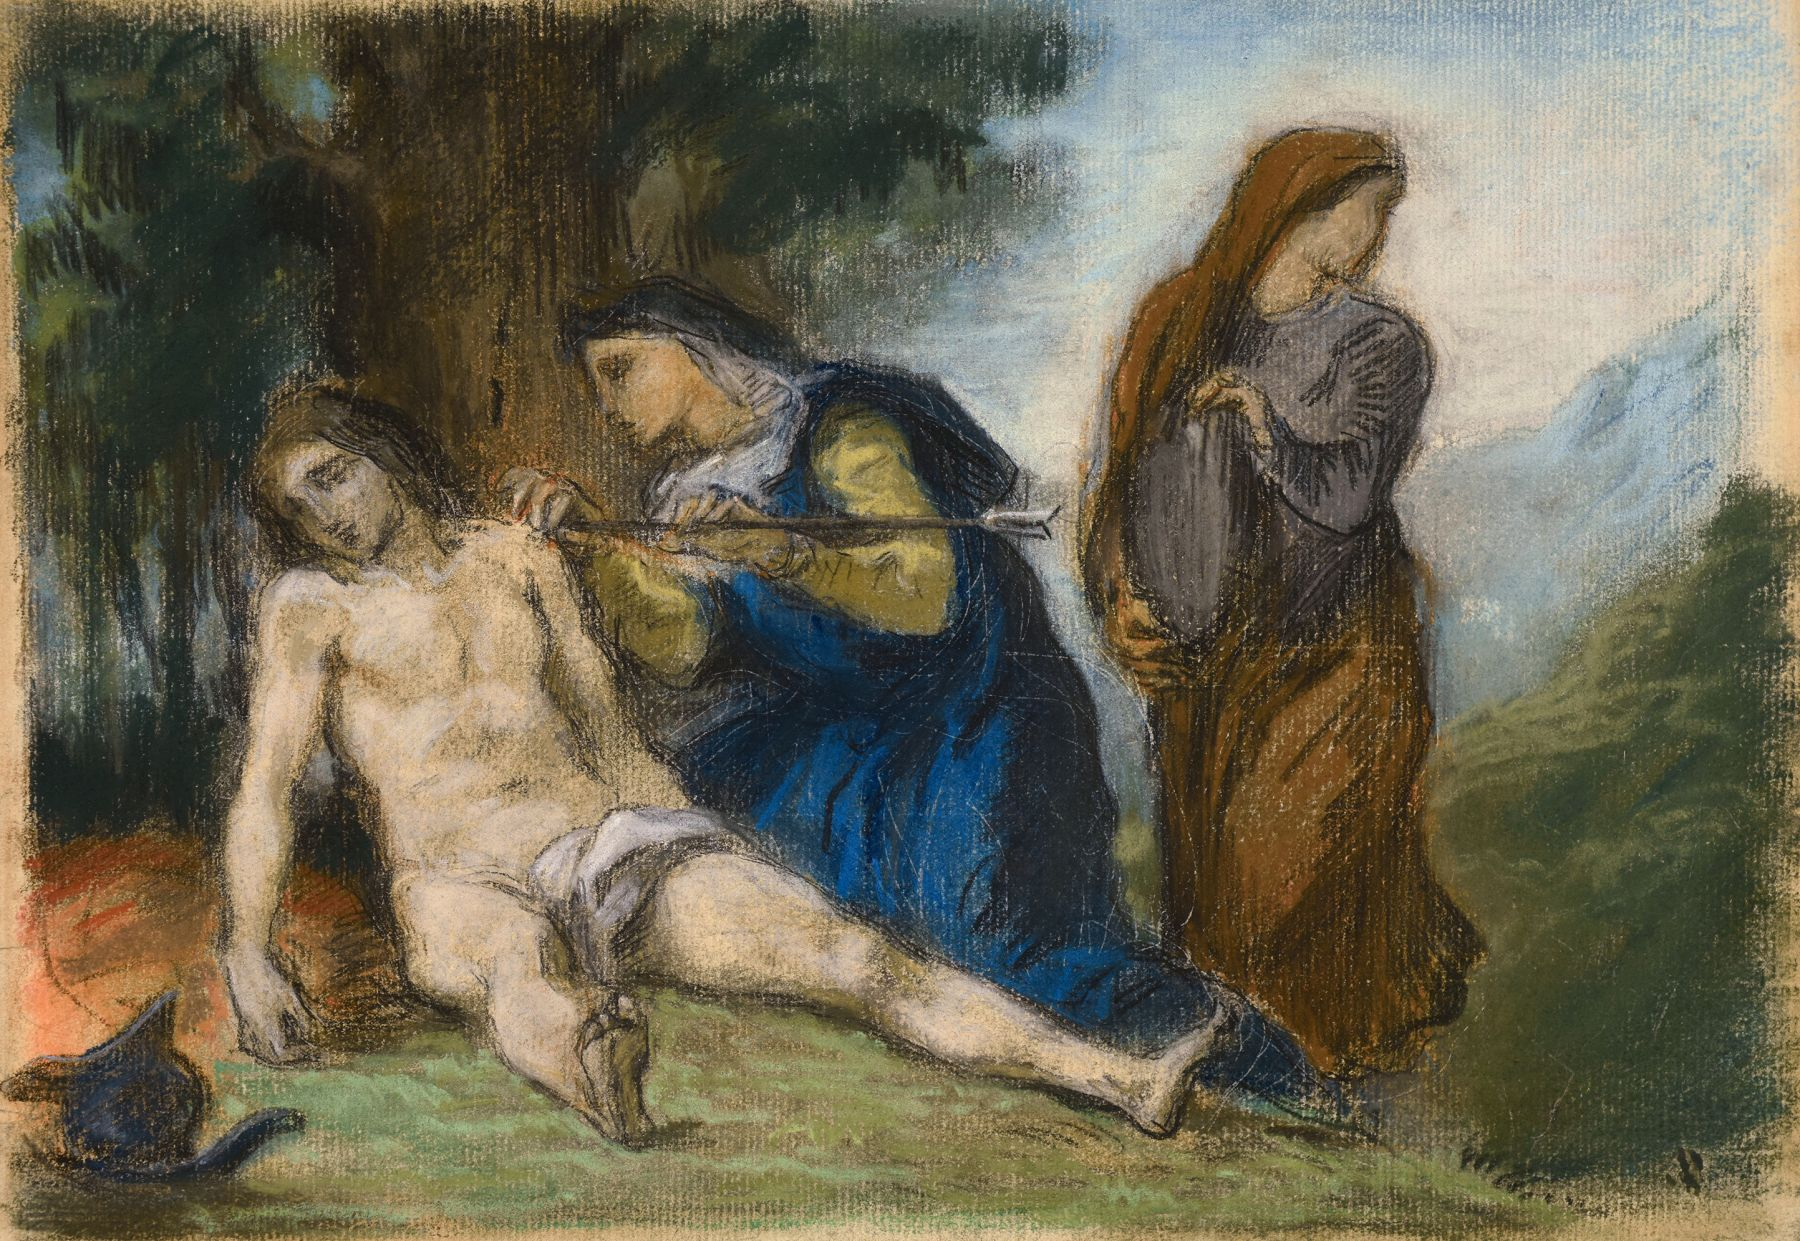 Eugène Delacroix, St. Sebastian Tended by the Holy Women, pastel on paper